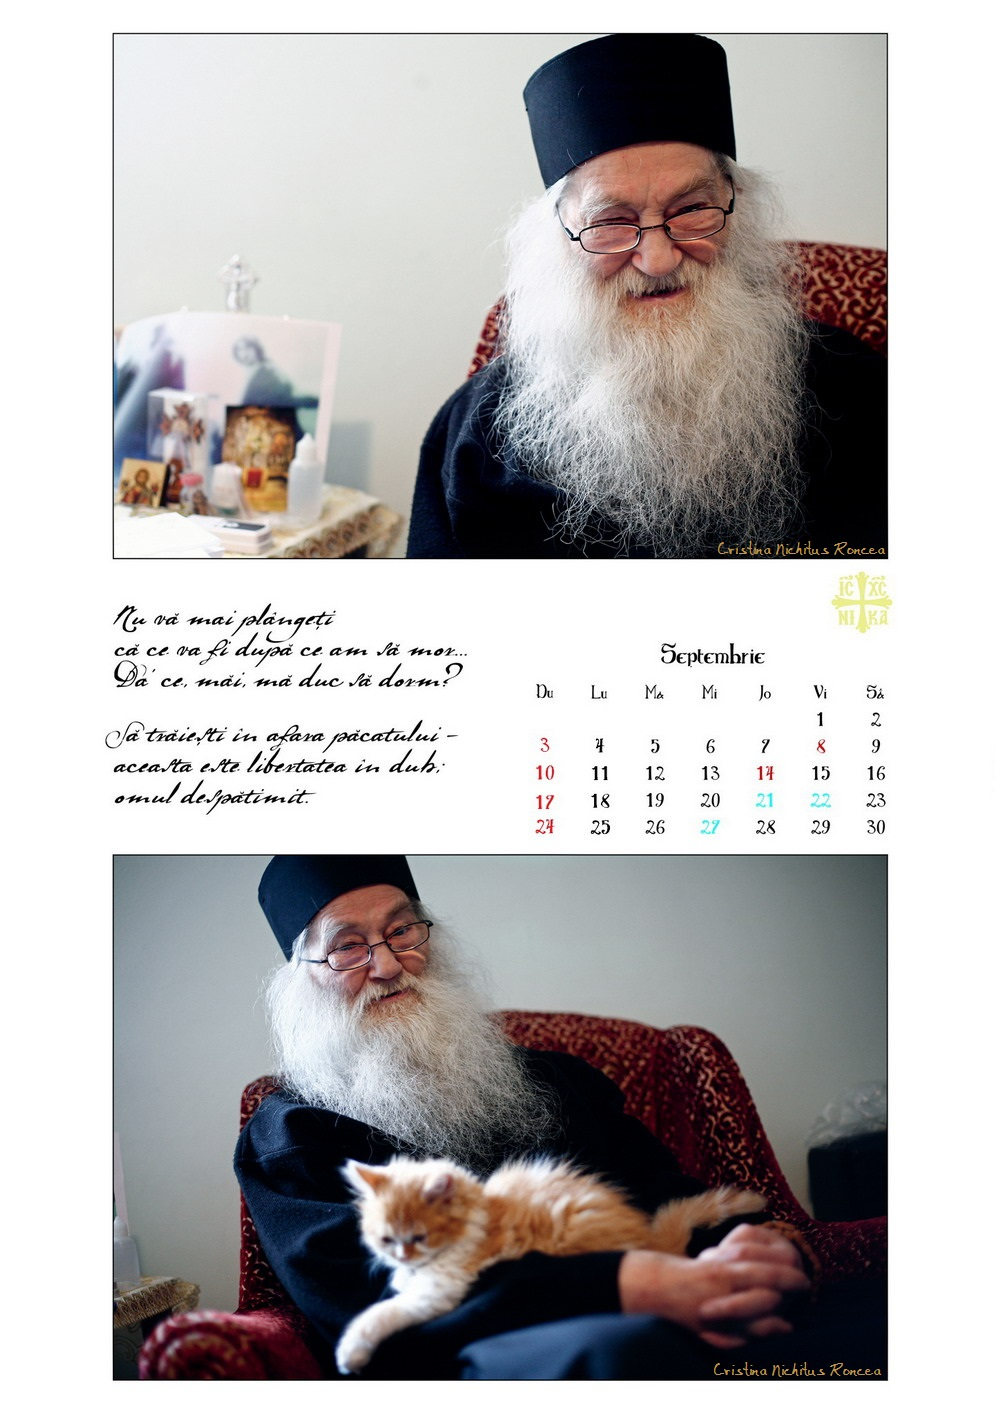 Calendar 2017 Parintele Justin Parvu Ro - Foto Cristina Nichitus Roncea si Manastirea Petru Voda 11